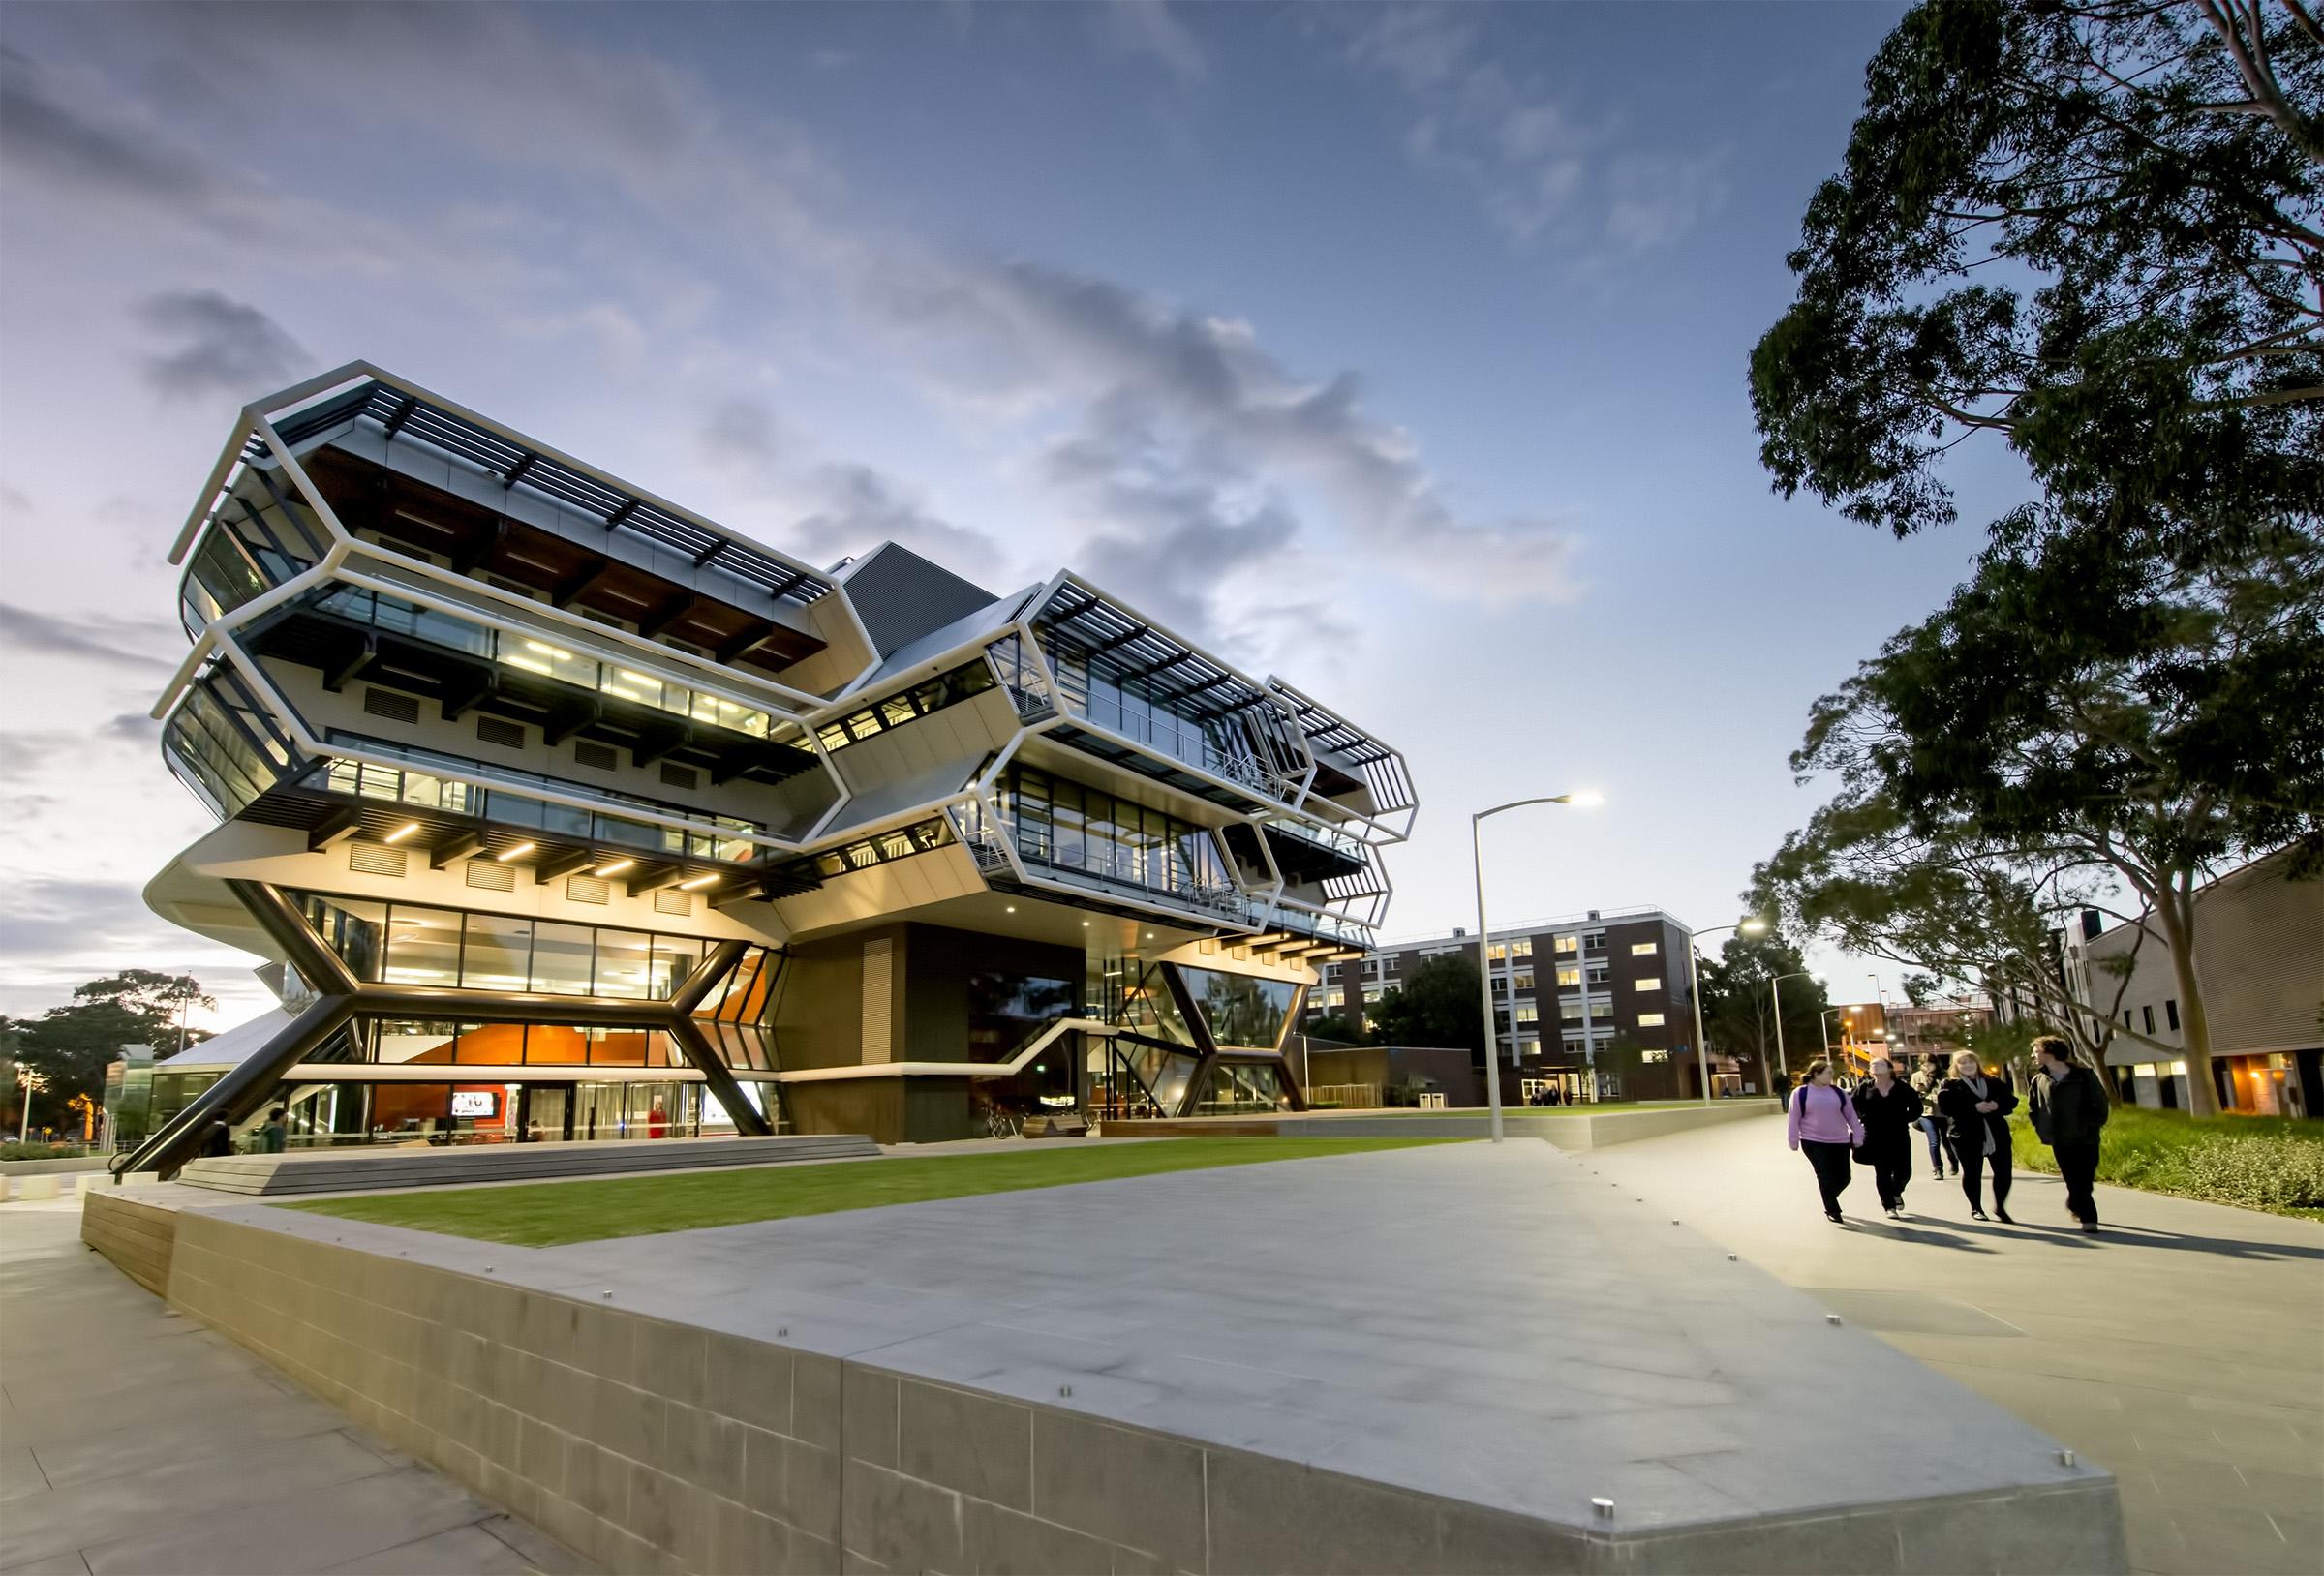 A large building at Monash University.